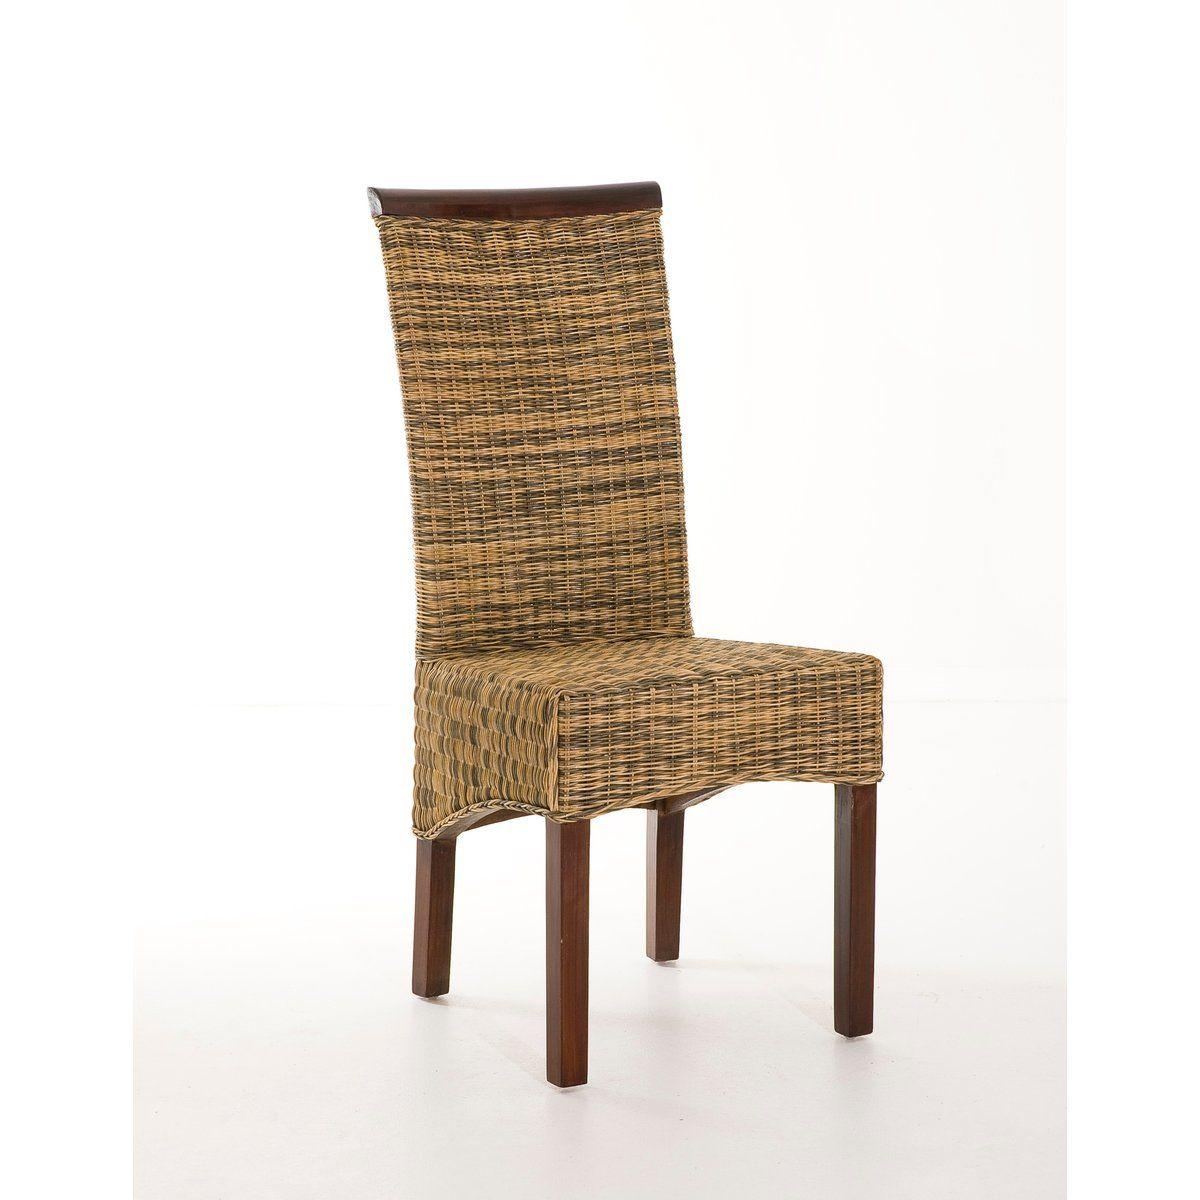 Chaise Structure En Bois Exotique Vernis Revetement Rotin Teinte Chene Moyen Chaise Rotin Chaise Chene